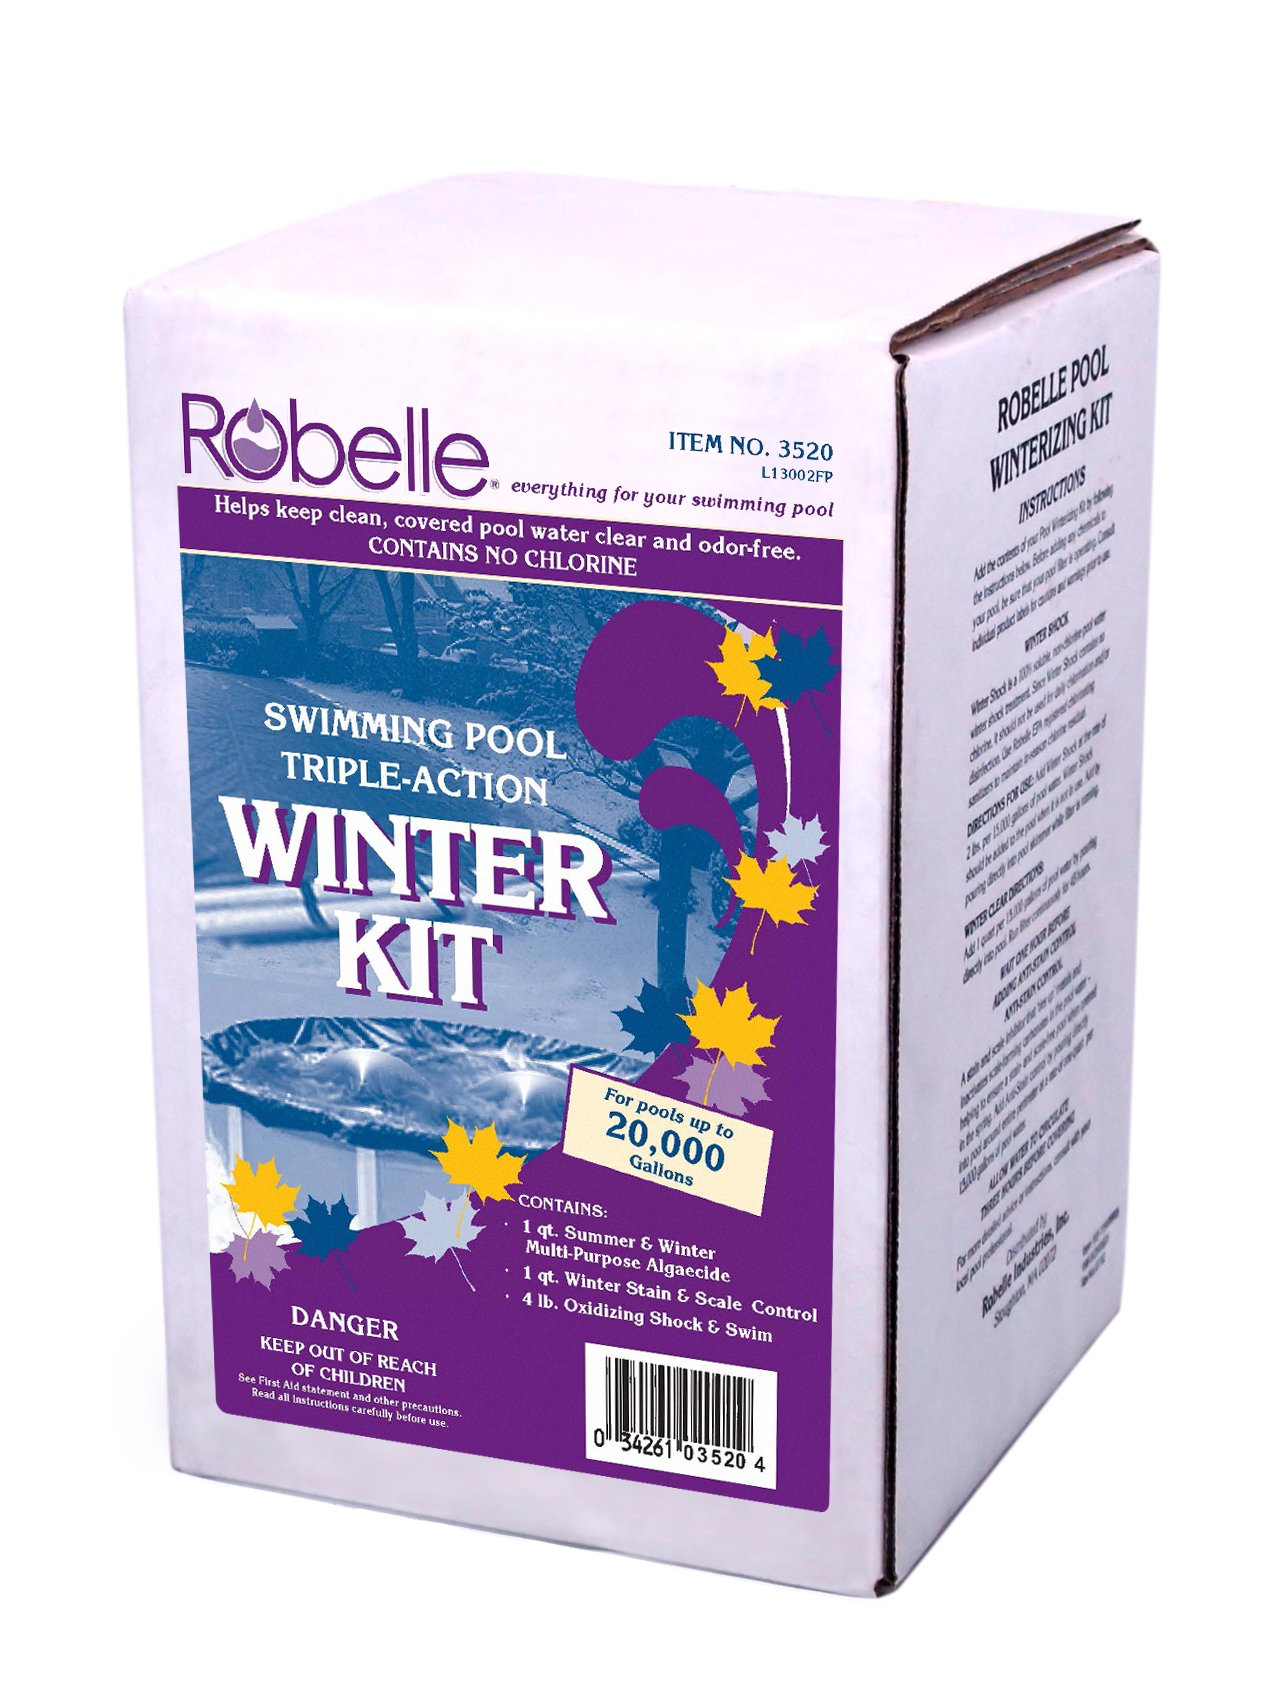 Robelle 3520 Swimming Pool Triple-Action Winter Kit, 20000-Gallon by Robelle